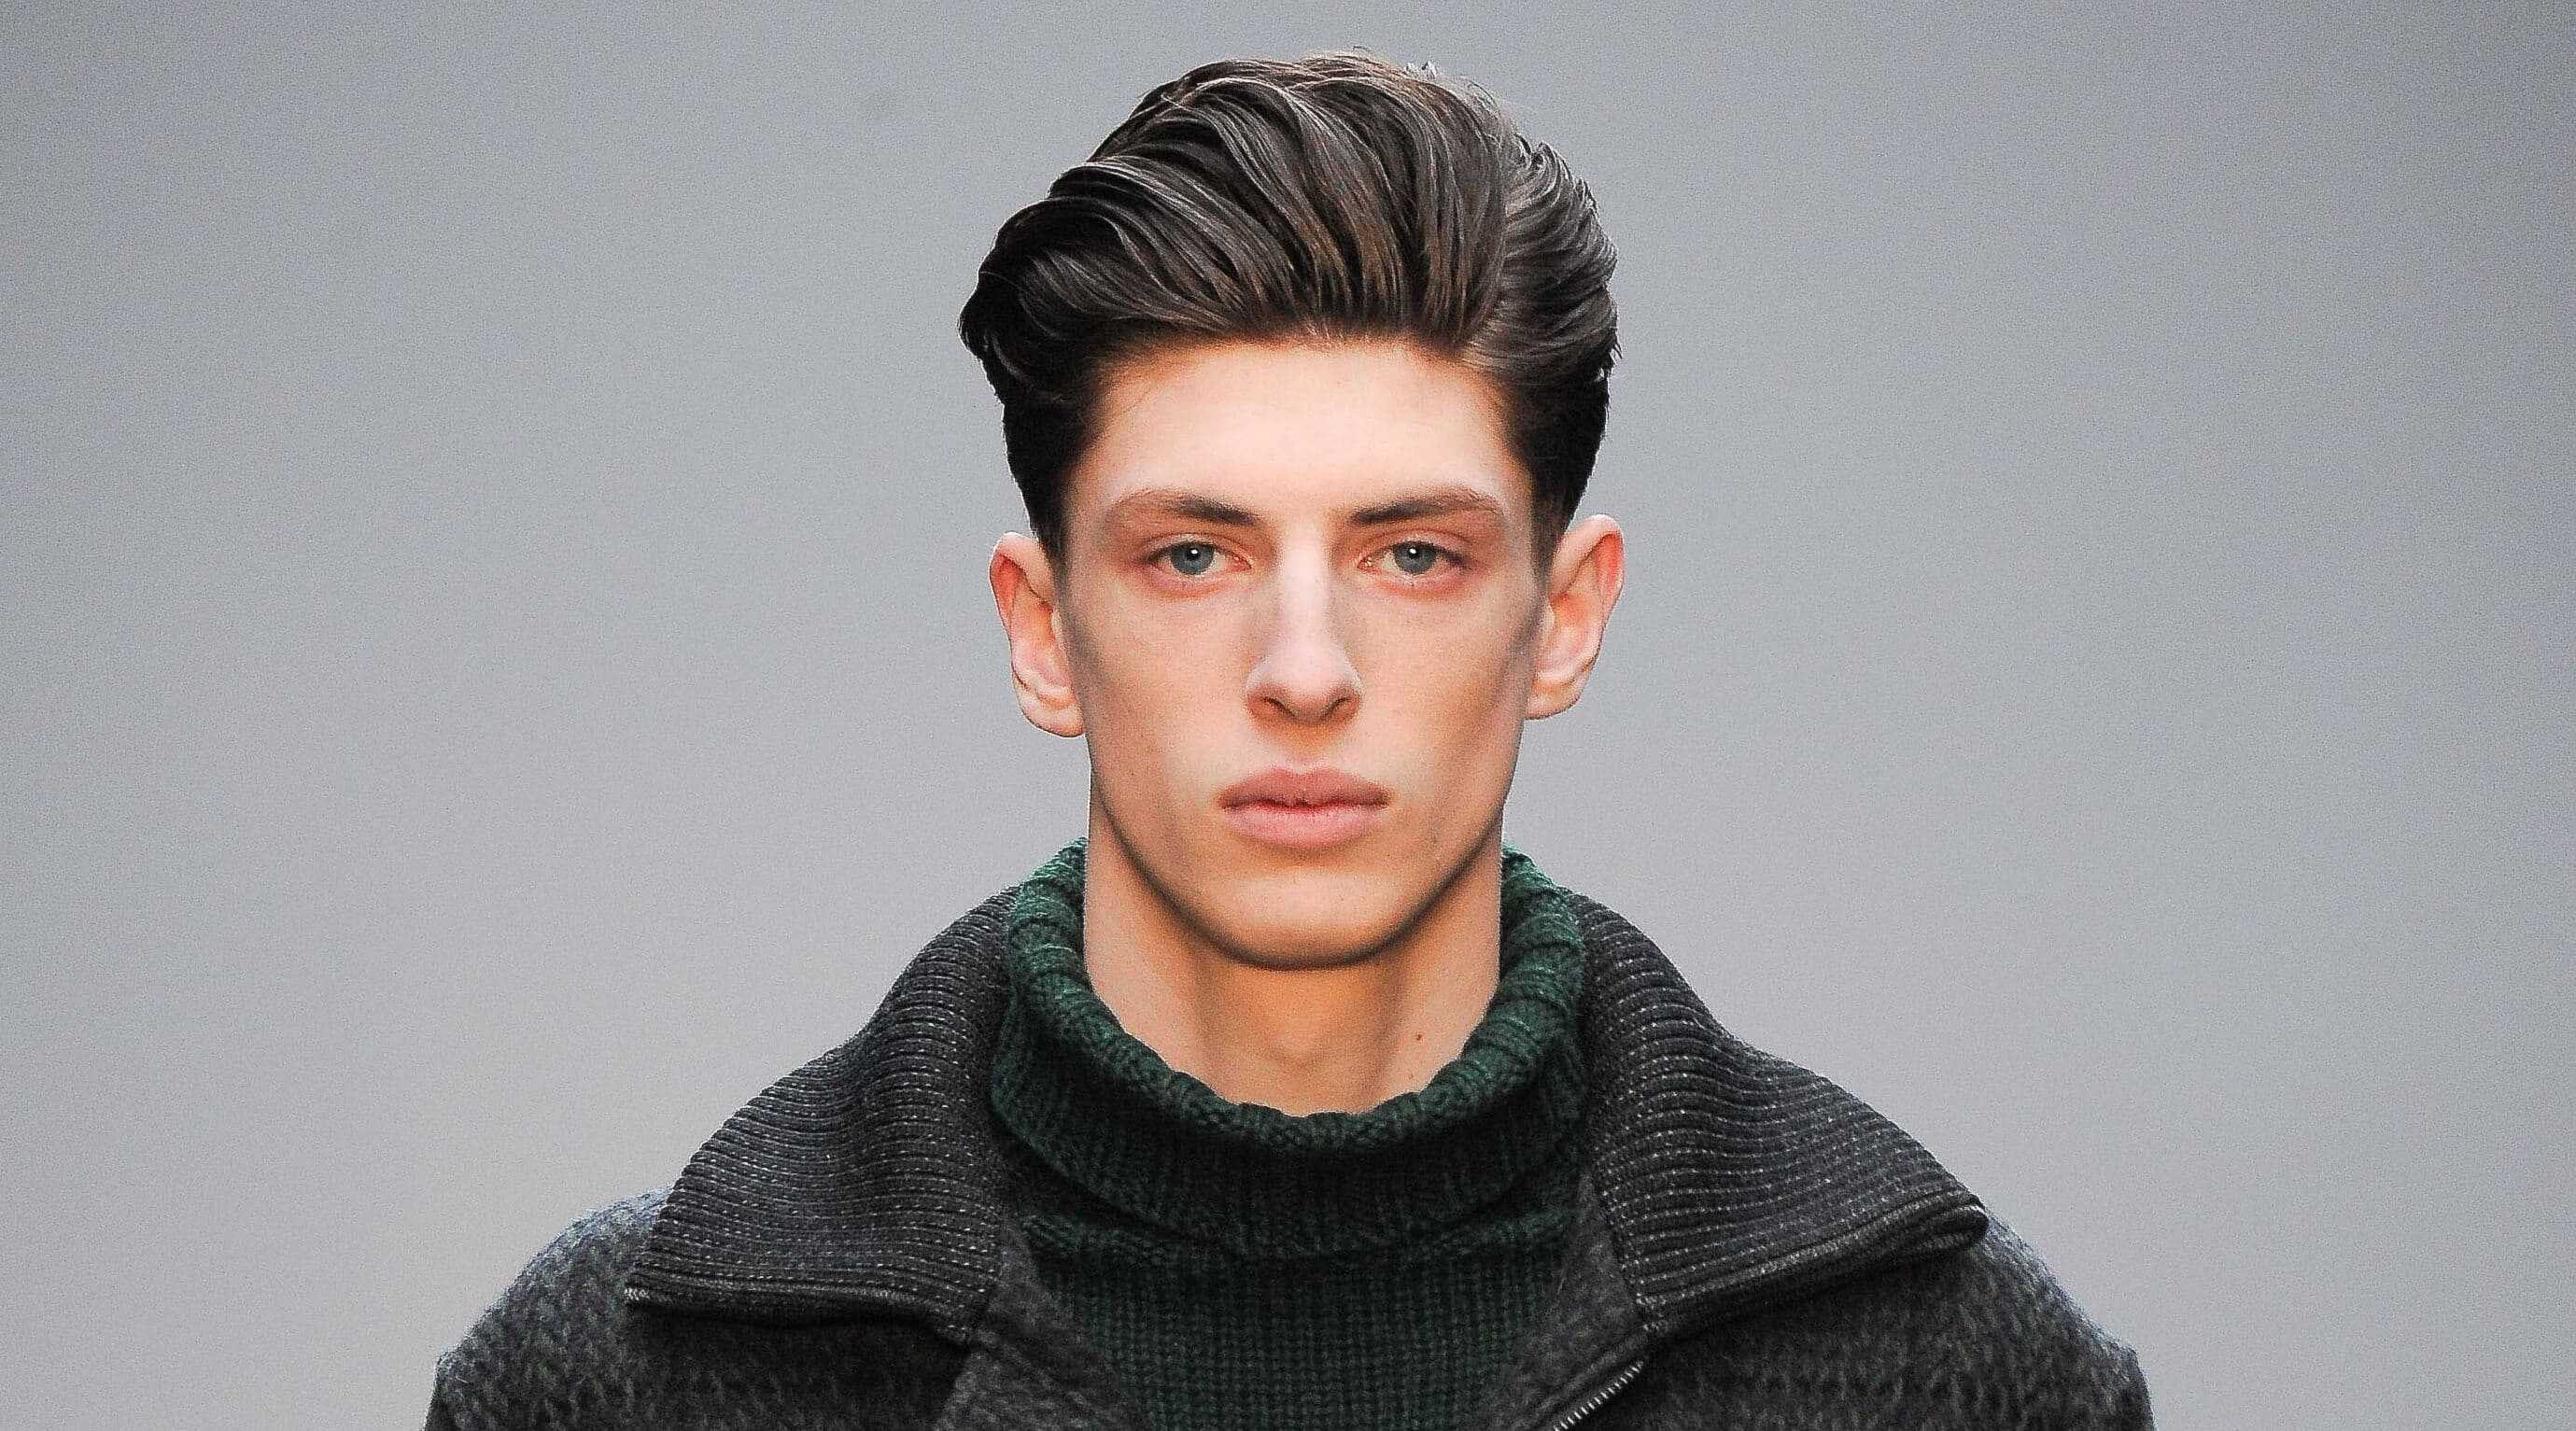 Quiff – classic mens hairstyle